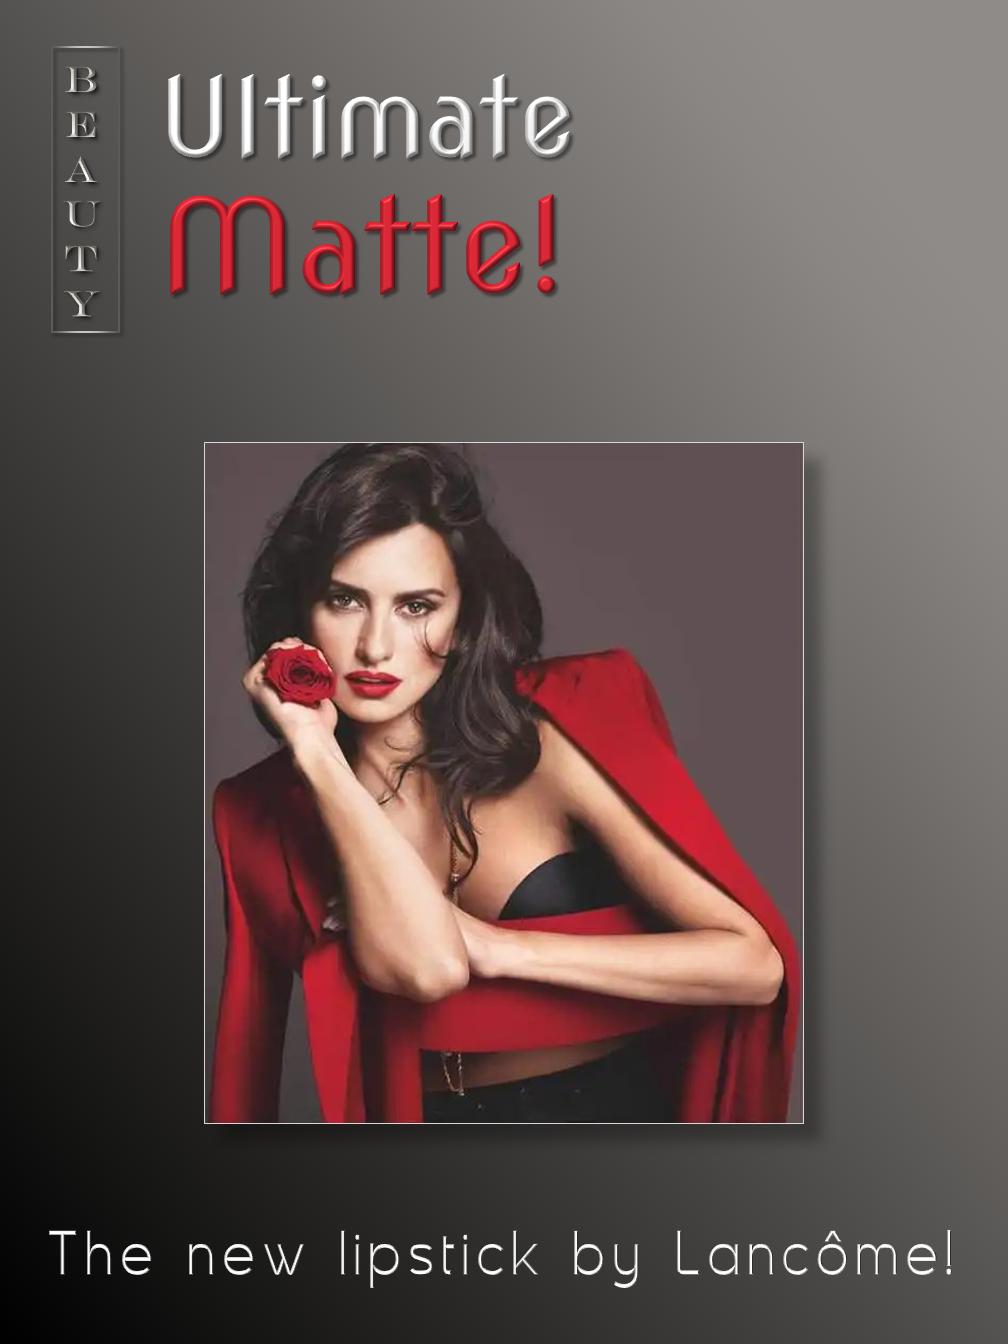 Ultimate Matte